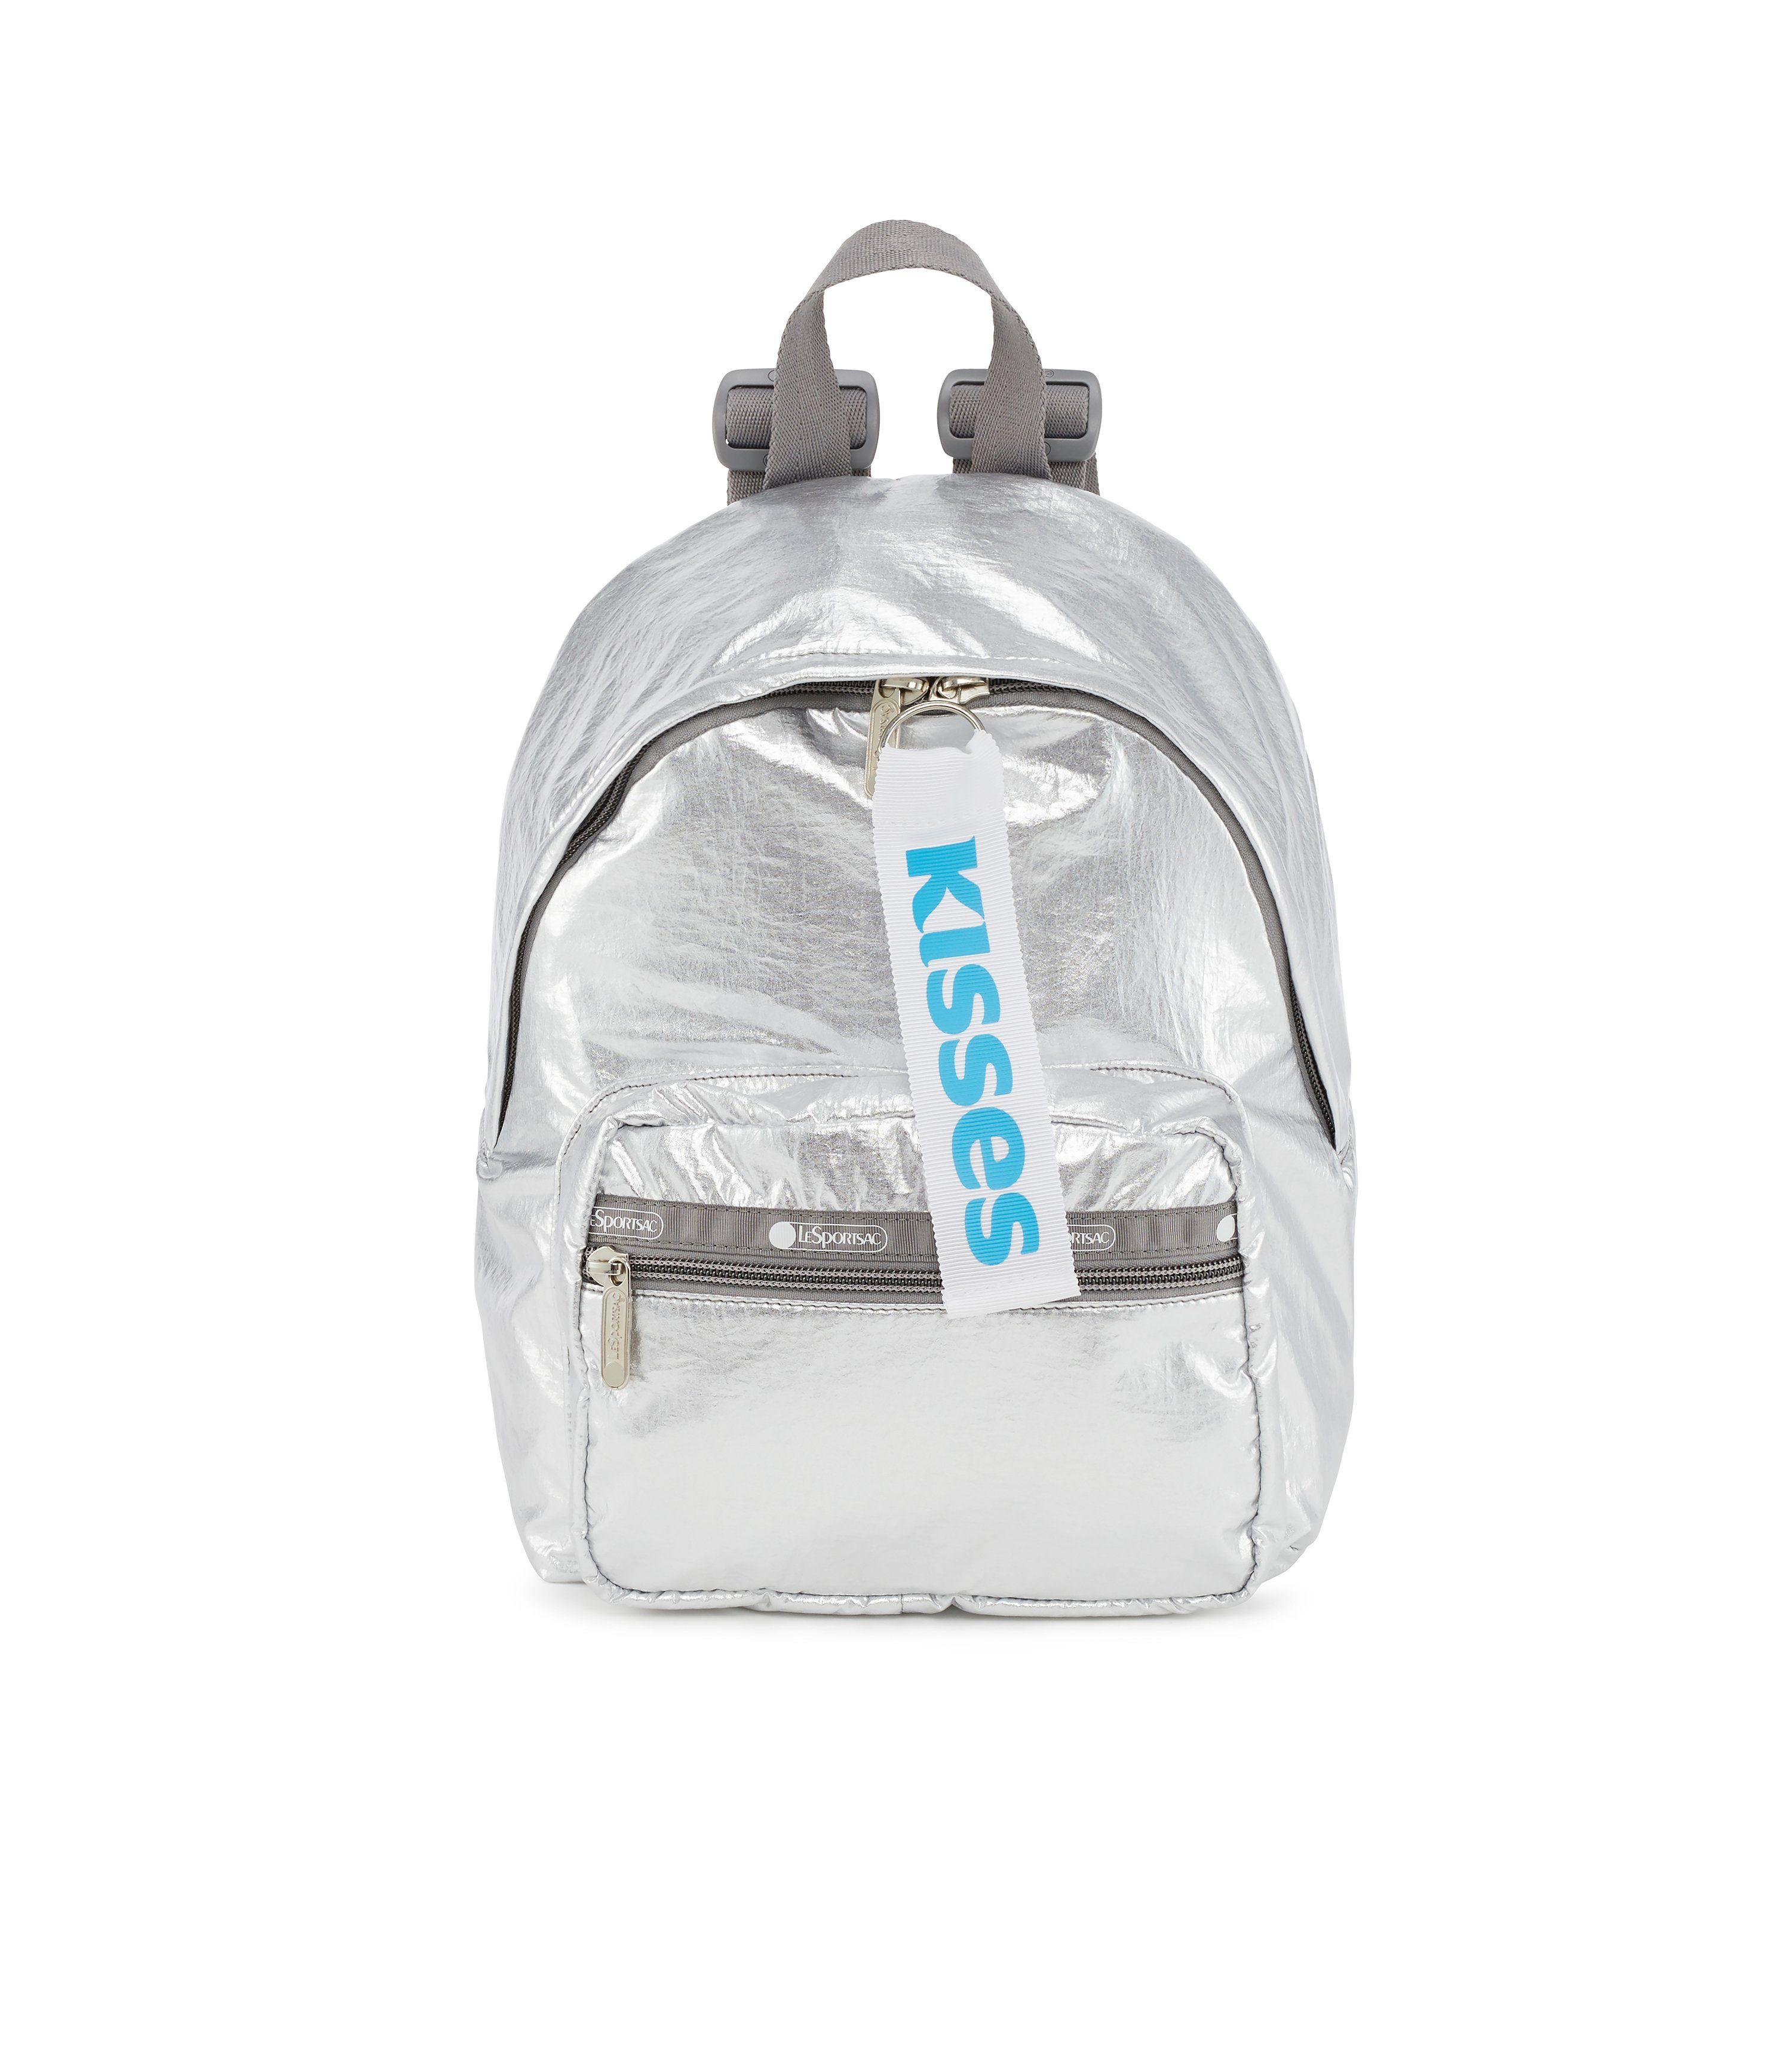 Cruising Backpack  LeSportsac  hershey  kisses  collaboration  chocolate   Metallic 39322e6551eb2